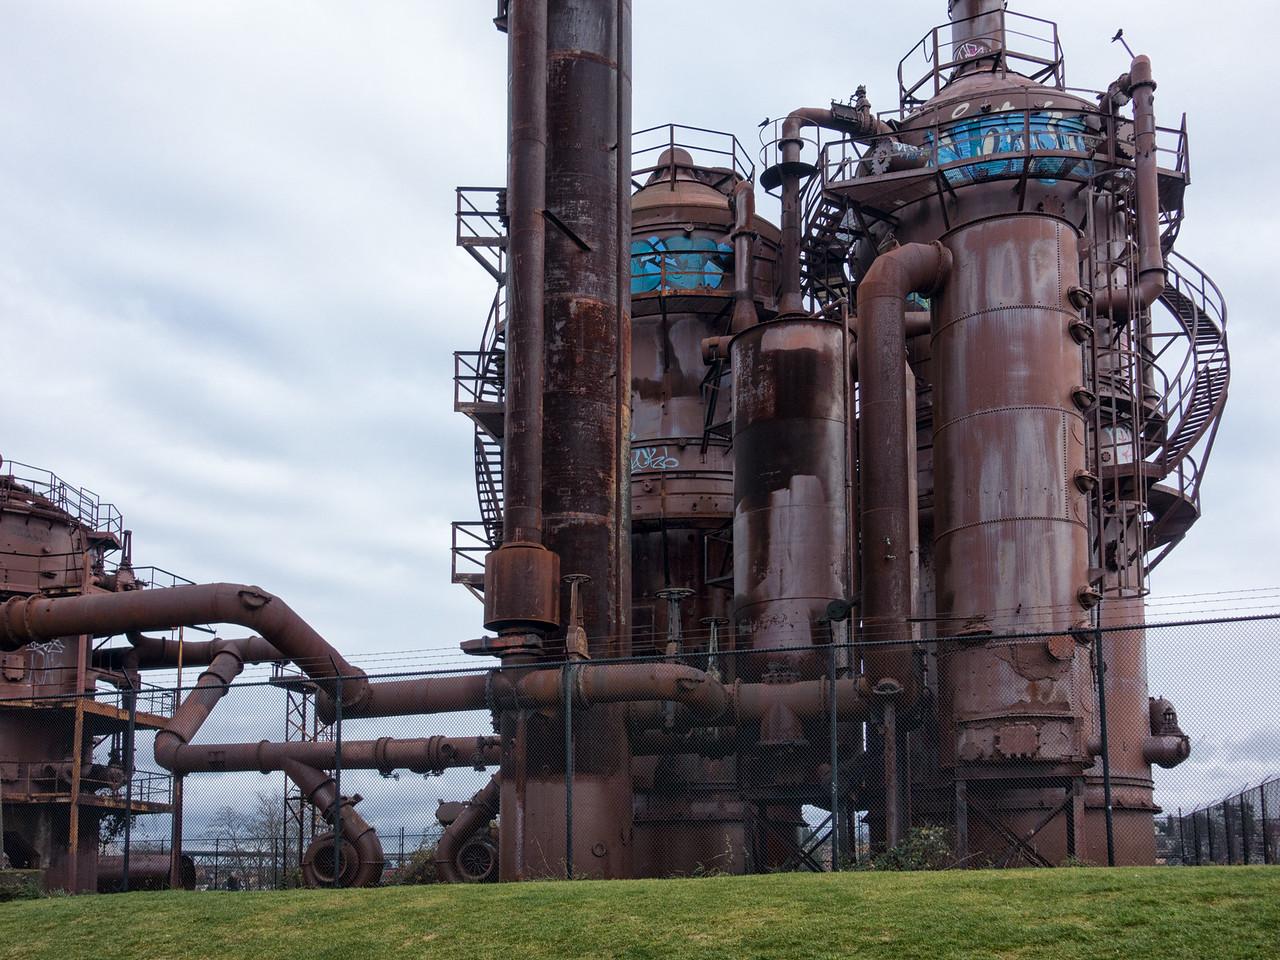 20151220.  Gas Works Park, Seattle, WA.